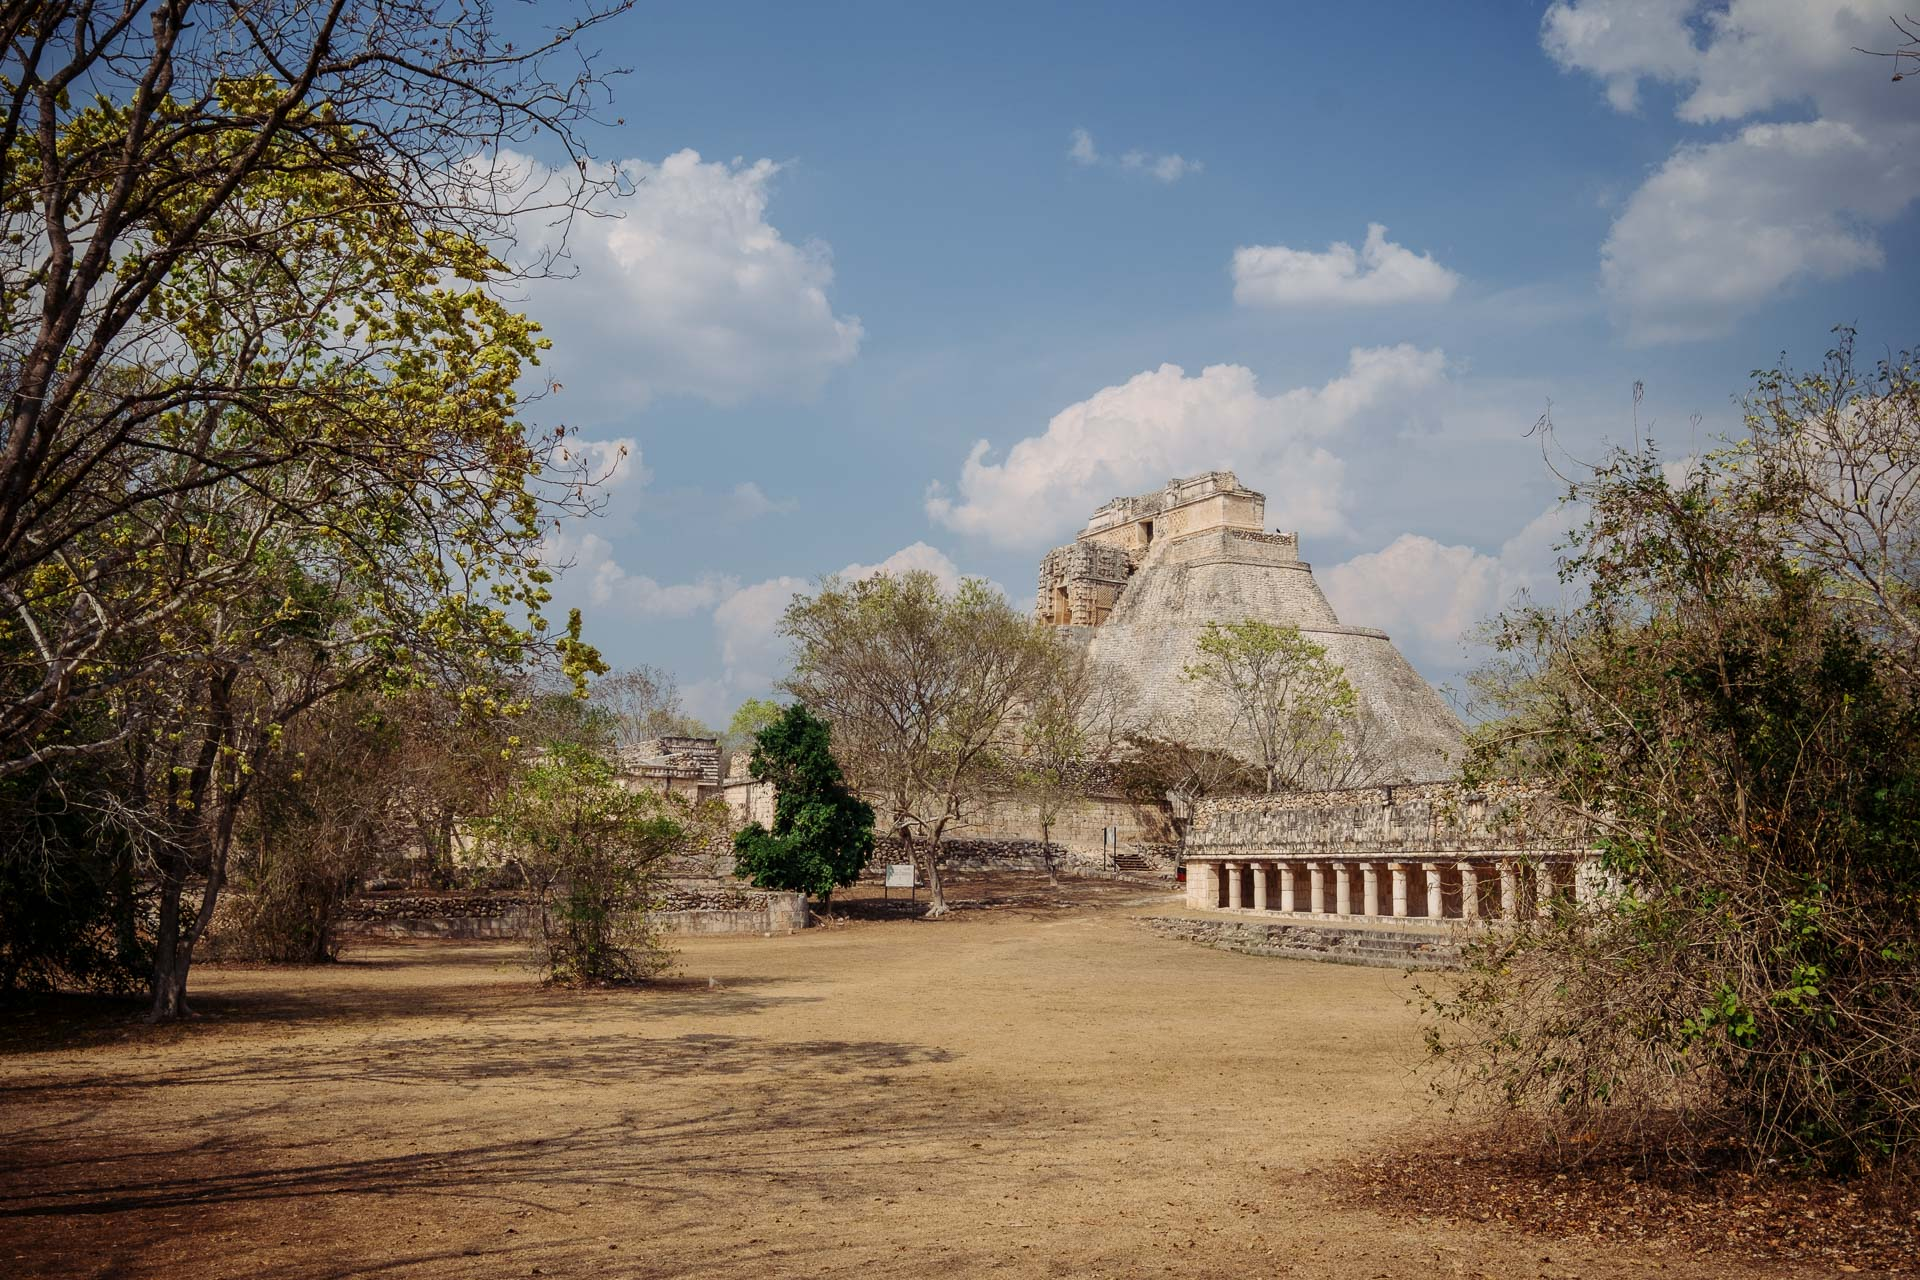 La cité Maya de Uxmal au Mexique